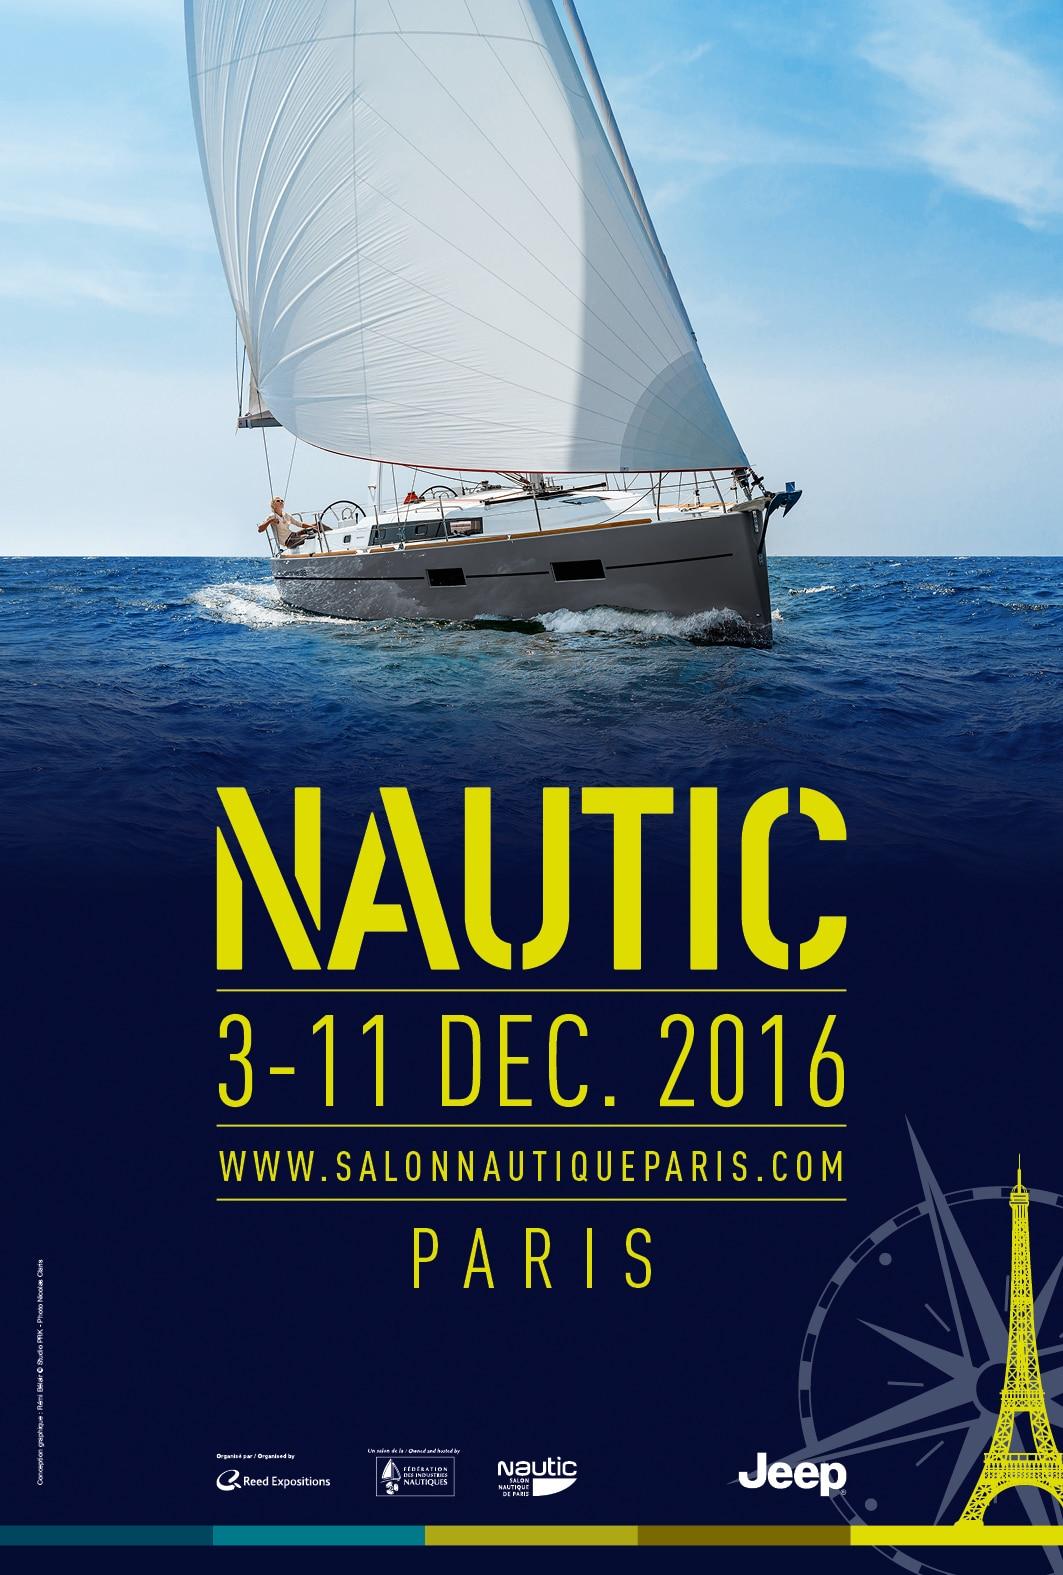 salon nautic affiche 2016 bateau 2